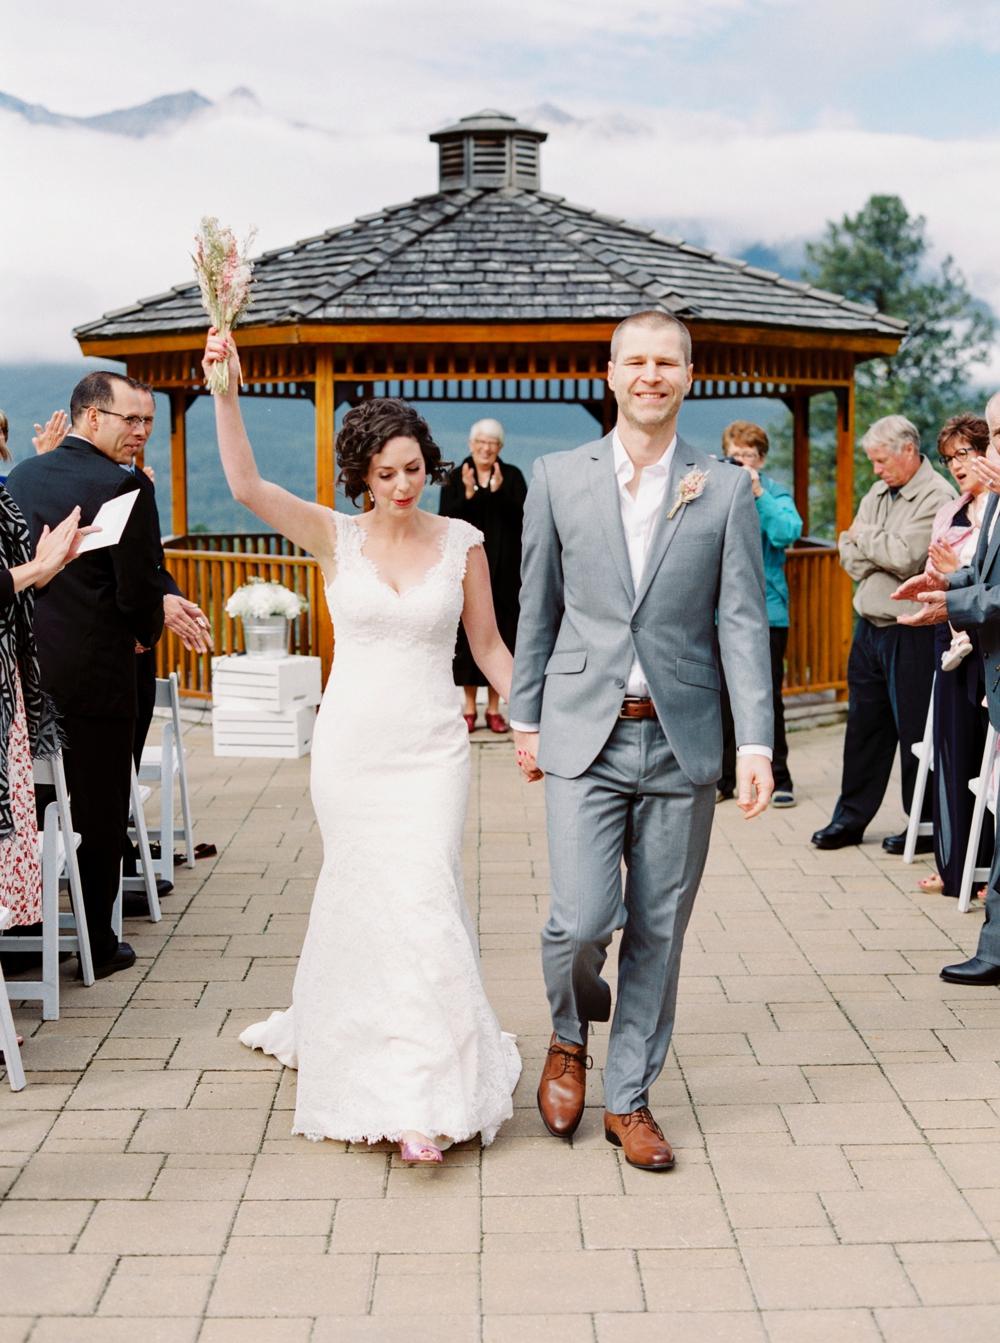 Canmore Wedding Photographers   Calgary Wedding Photographer   Silver Tip Wedding   Rocky Mountain Elopement